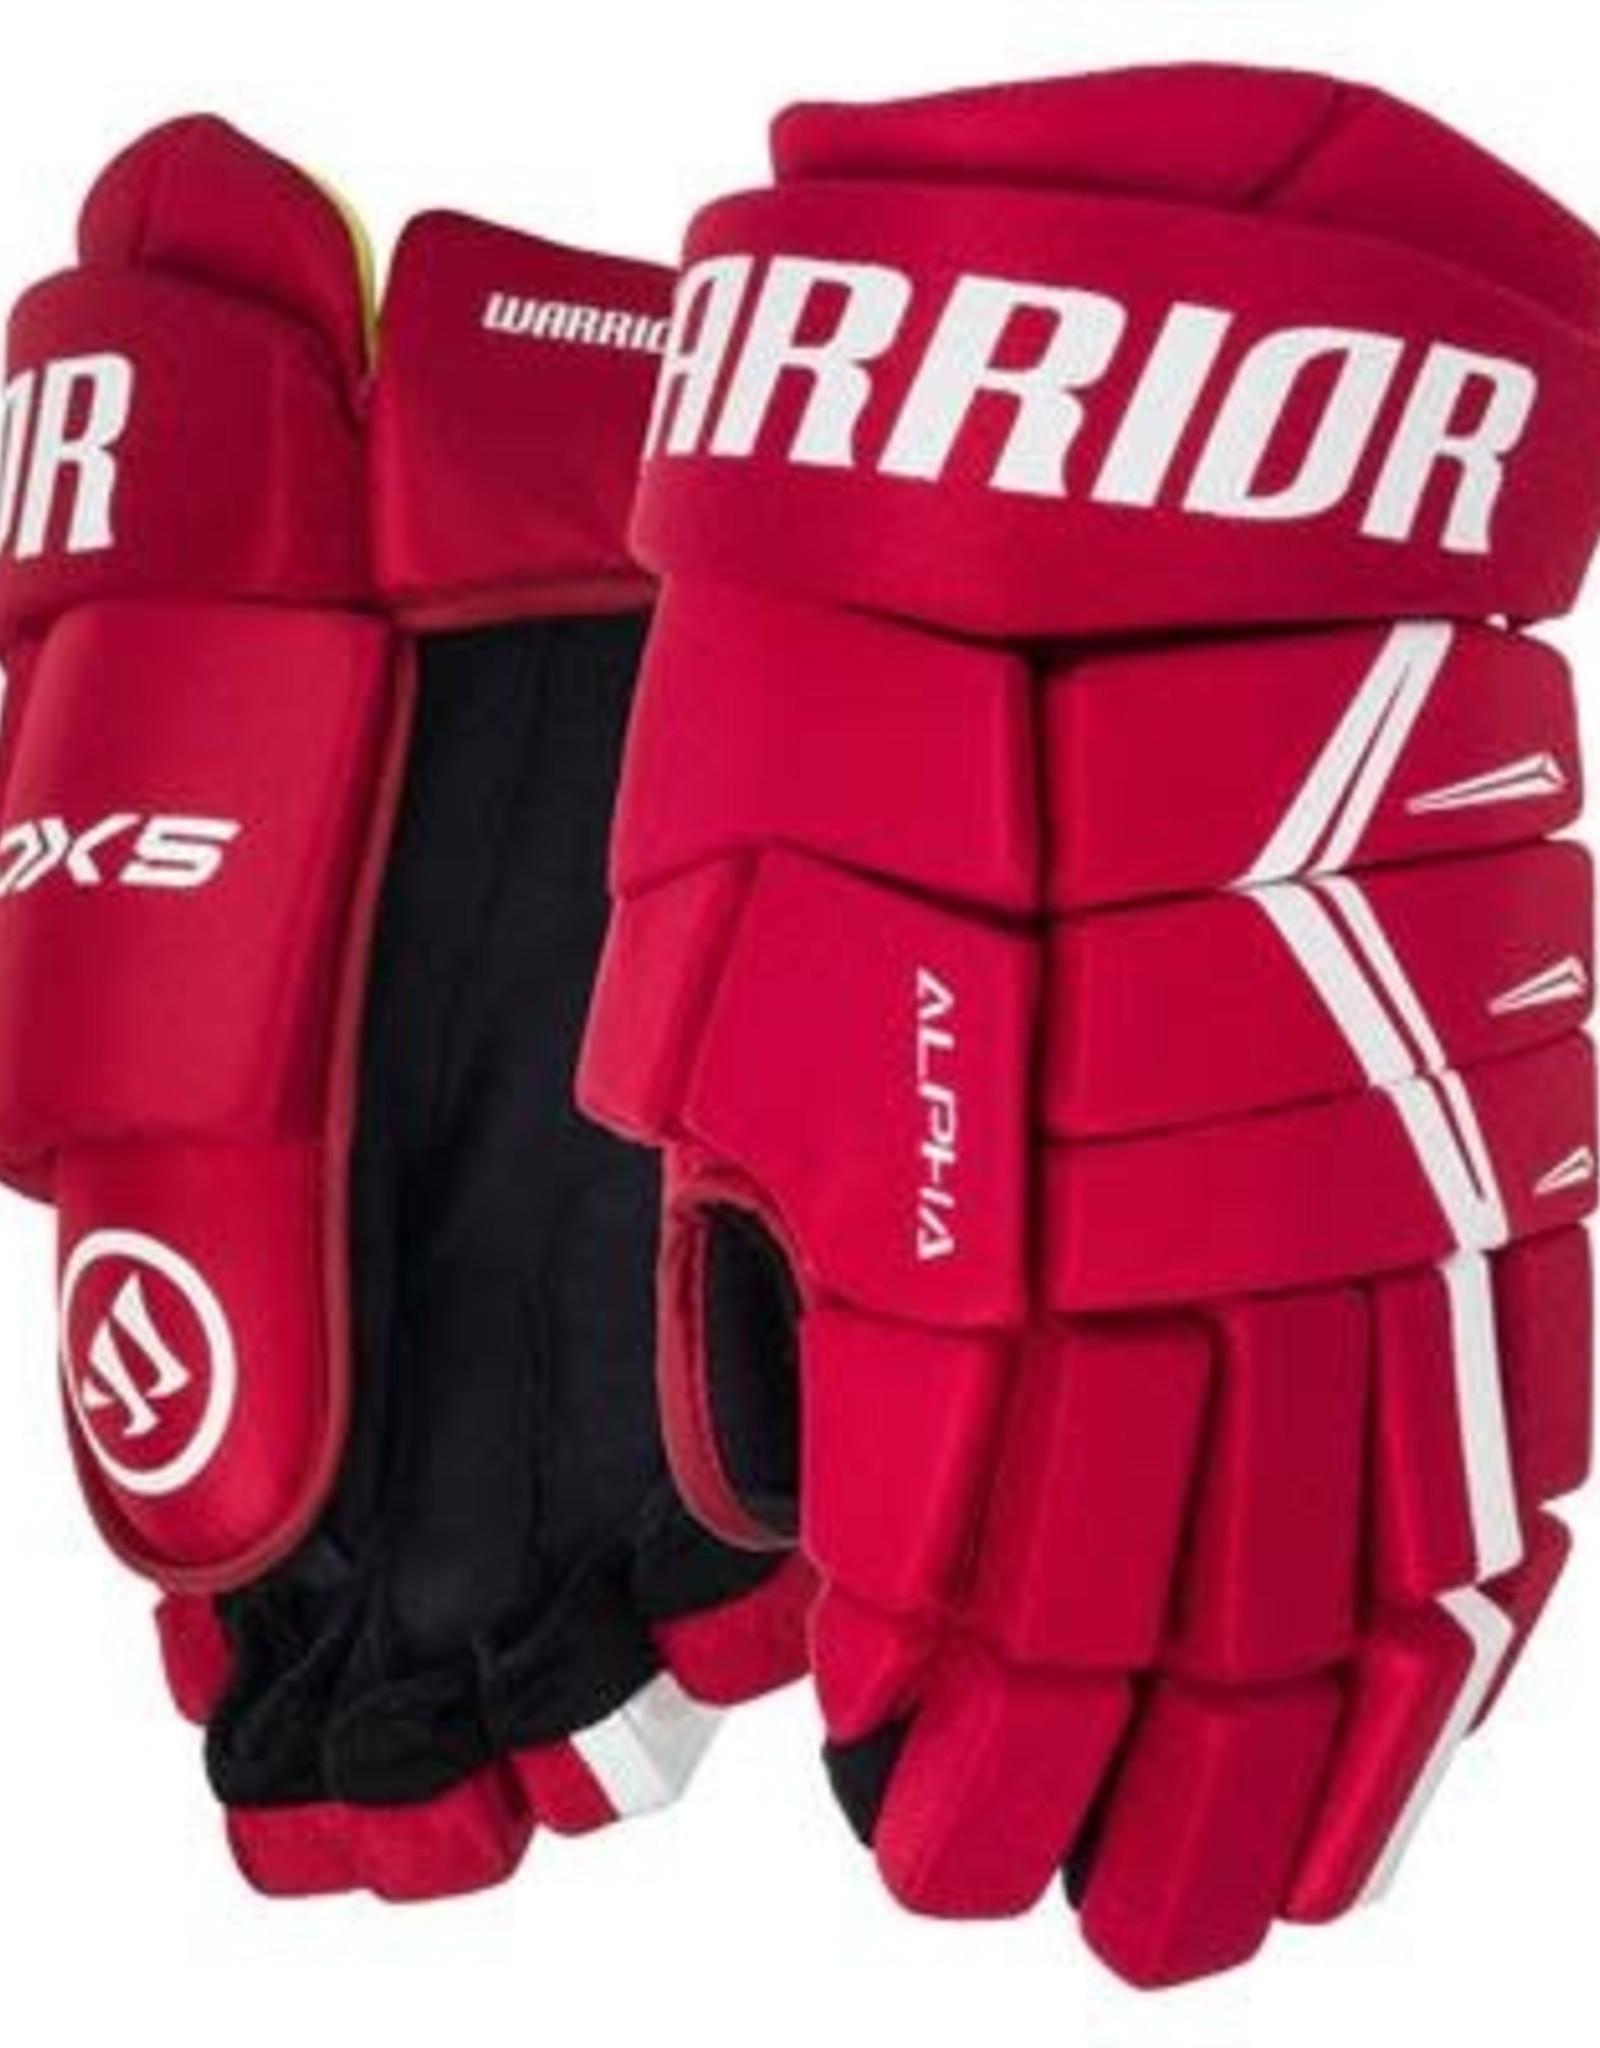 DX5 Senior Glove RDW RD/WHITE 13